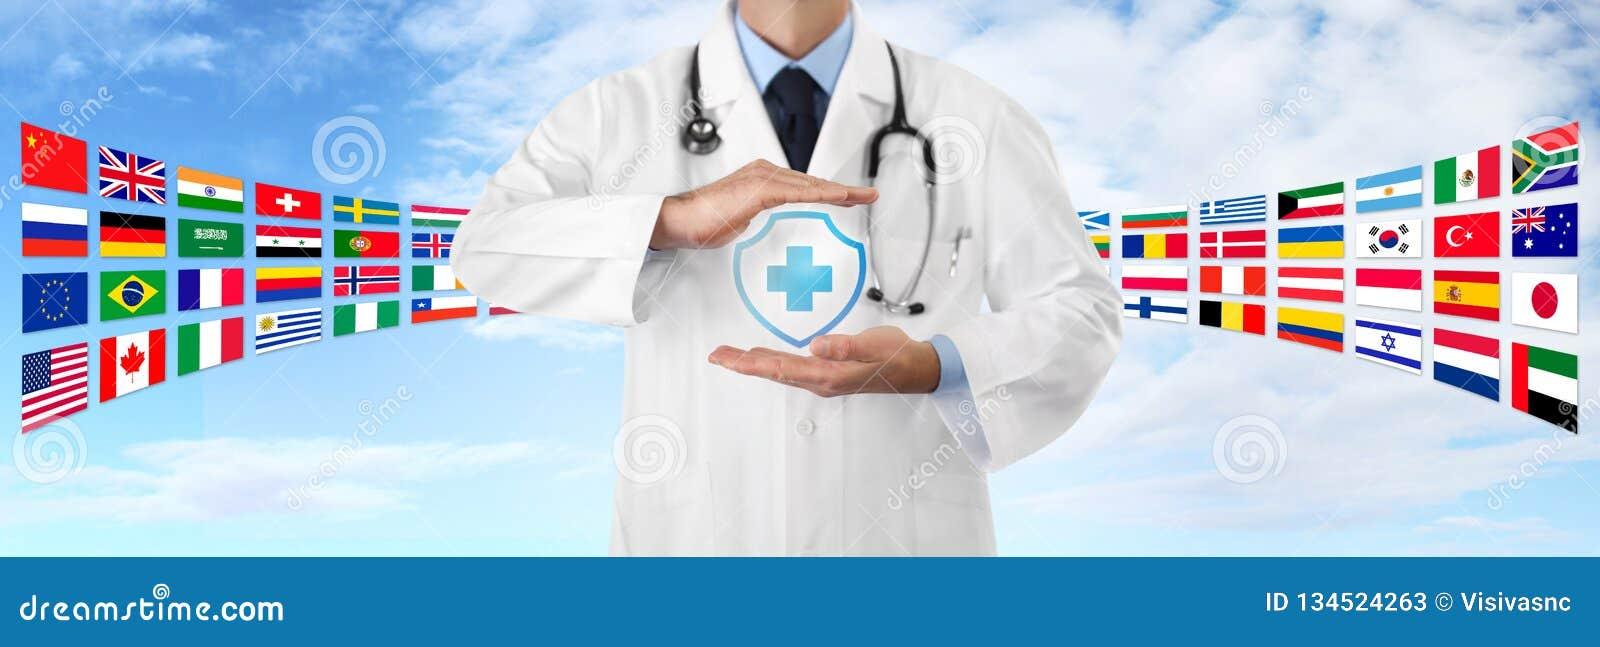 International Travel Medical Insurance Concept Doctors Hands